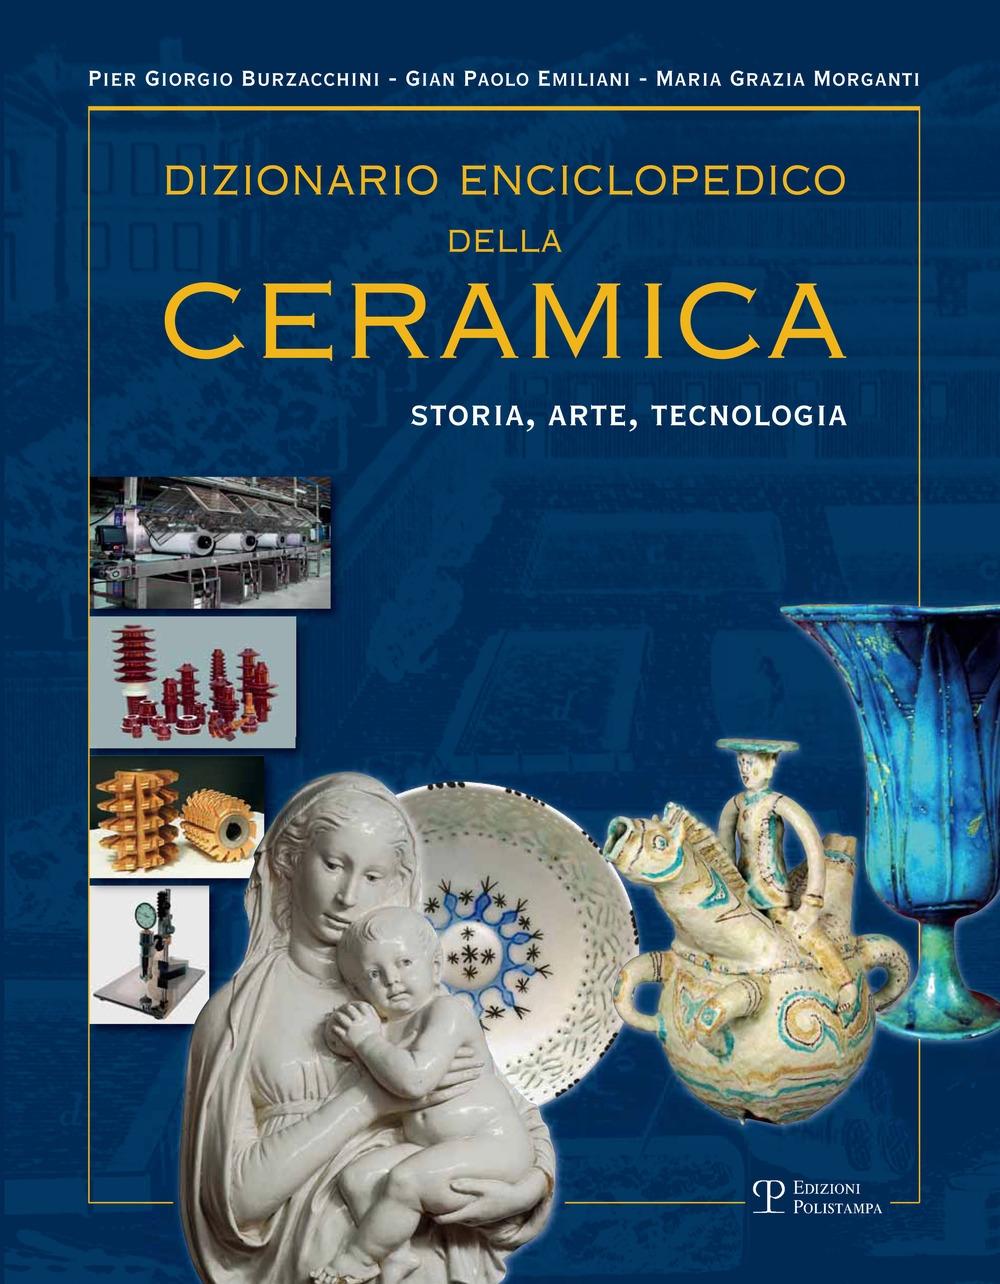 Dizionario Enciclopedico della Ceramica. Storia, Arte, Tecnologia. Vol. 2.